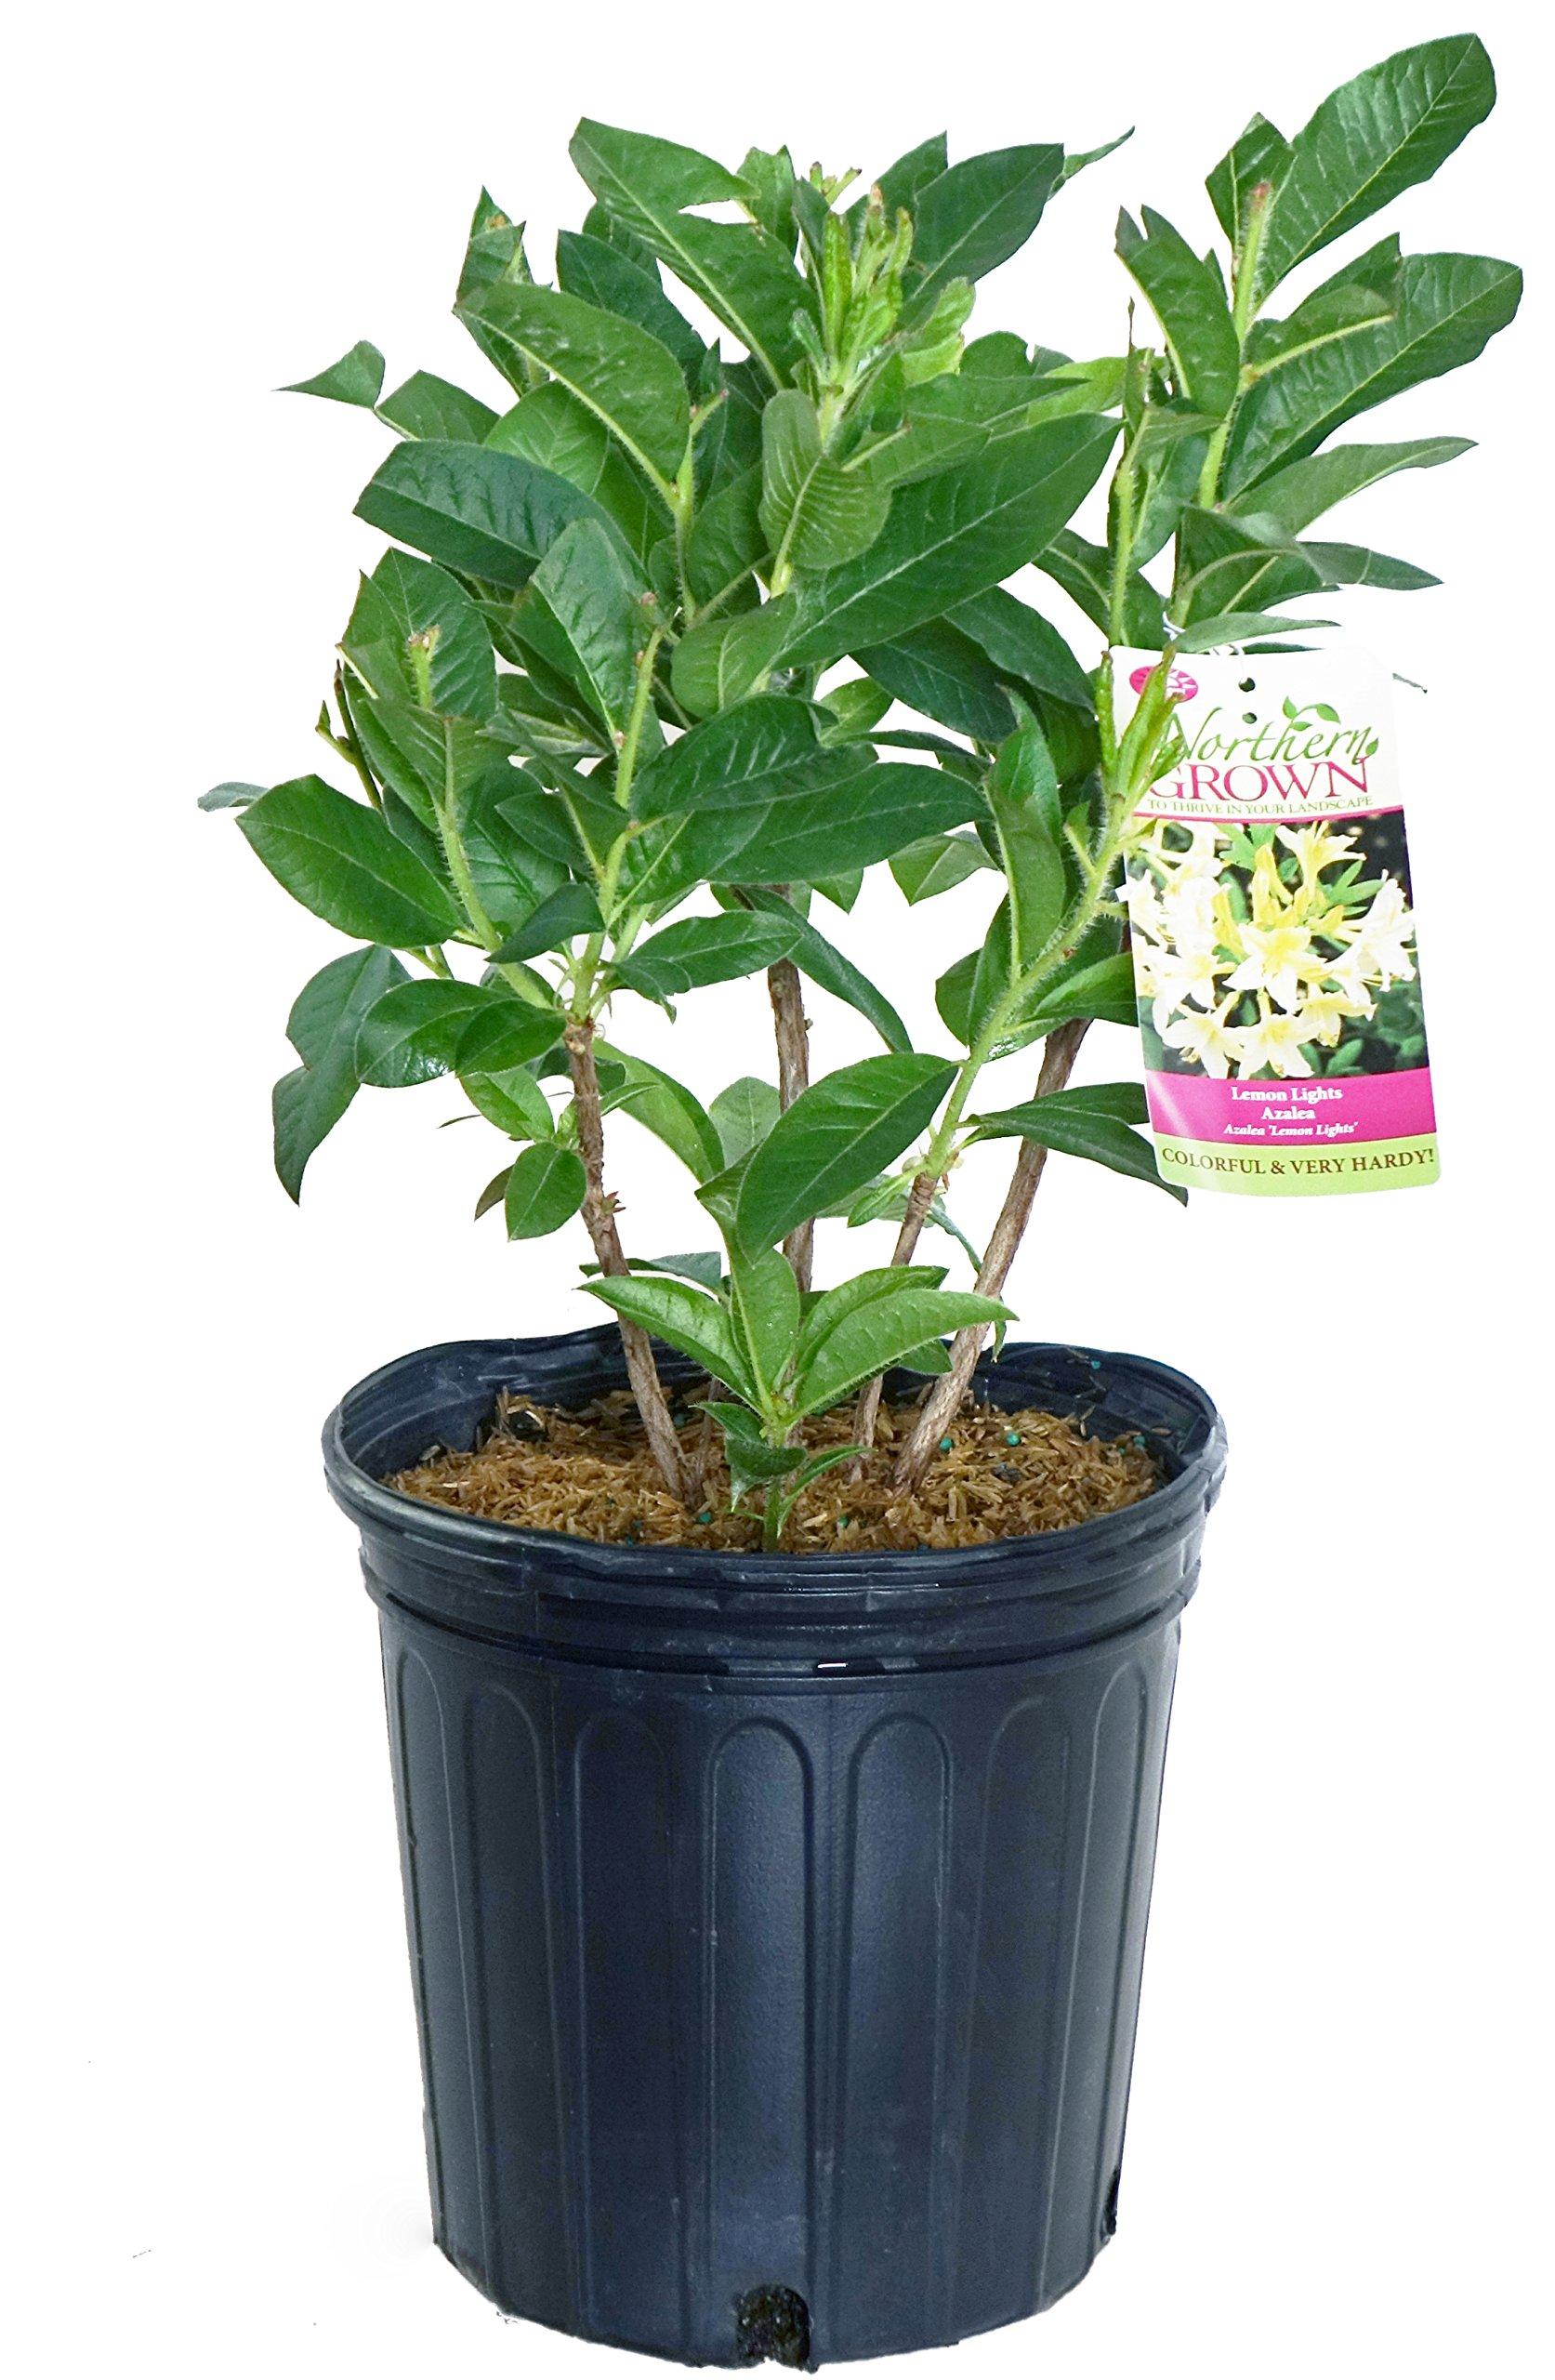 Azalea 'Lemon Lights' (Exbury Hybrid) Shrub, Yellow Flowers, 2 - Size Container